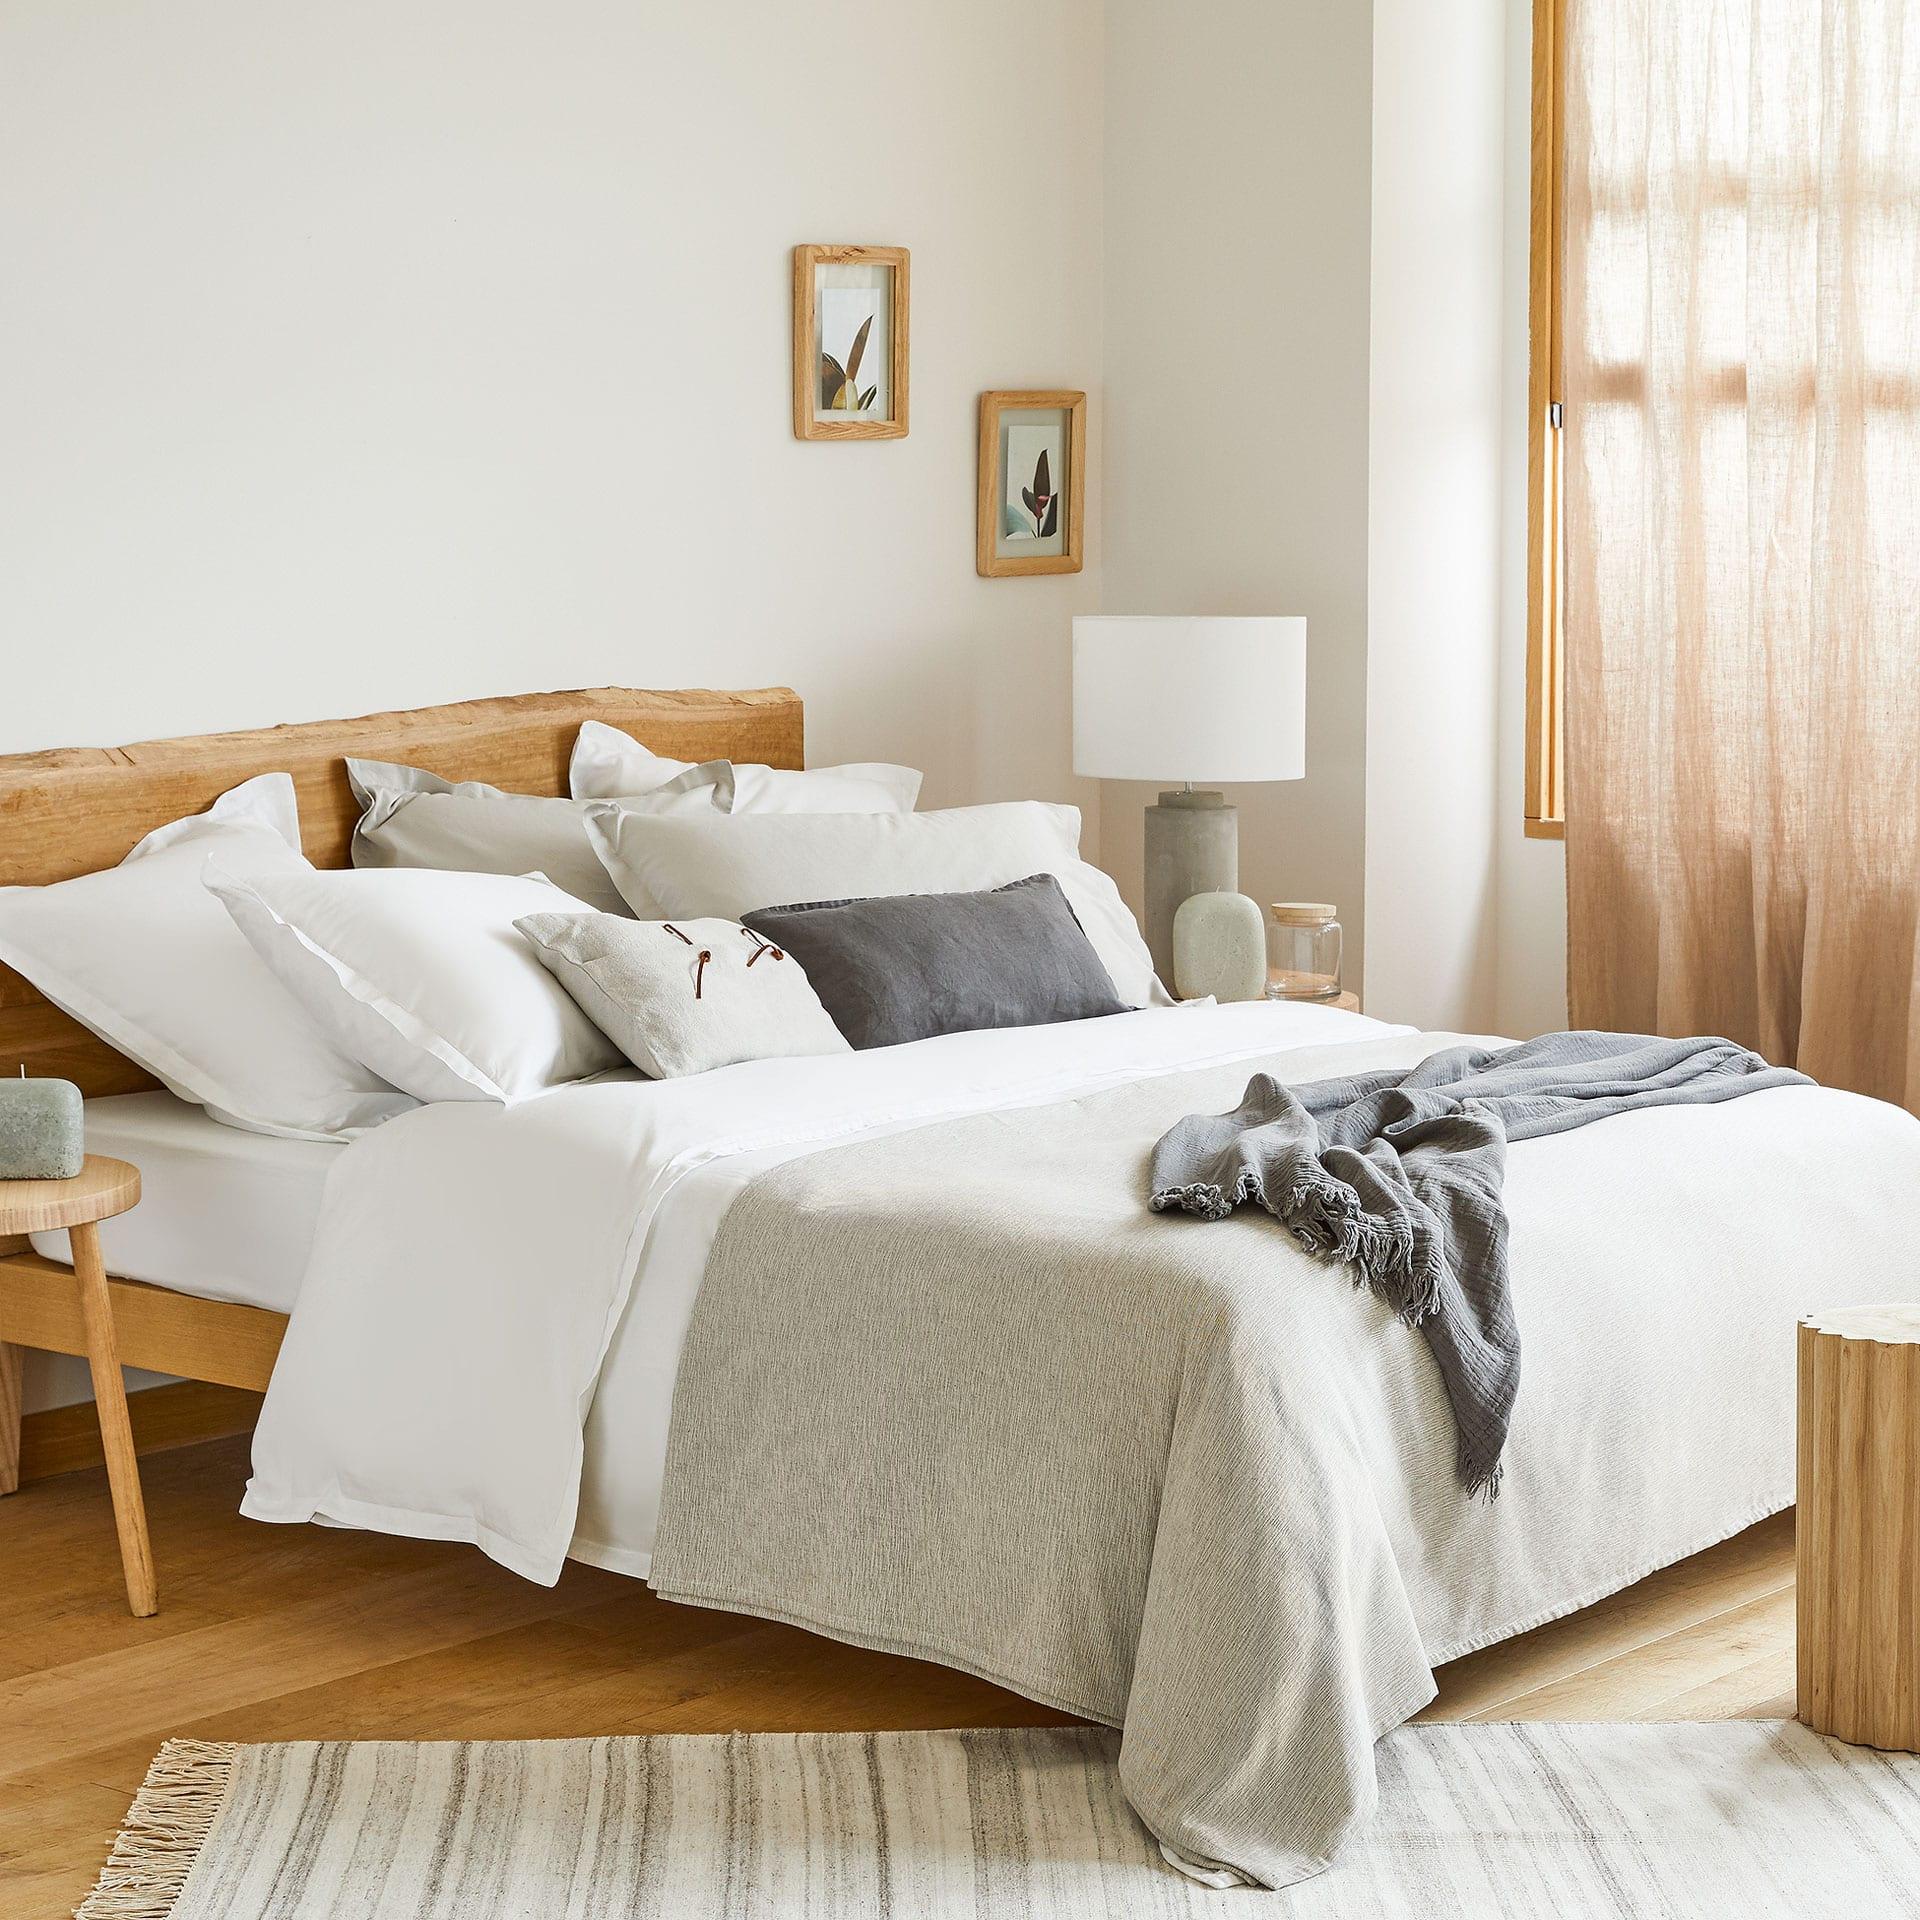 Bedwelming Taupe multi sprei met melange effect - SPREIEN - SLAAPKAMER | Zara &VY47